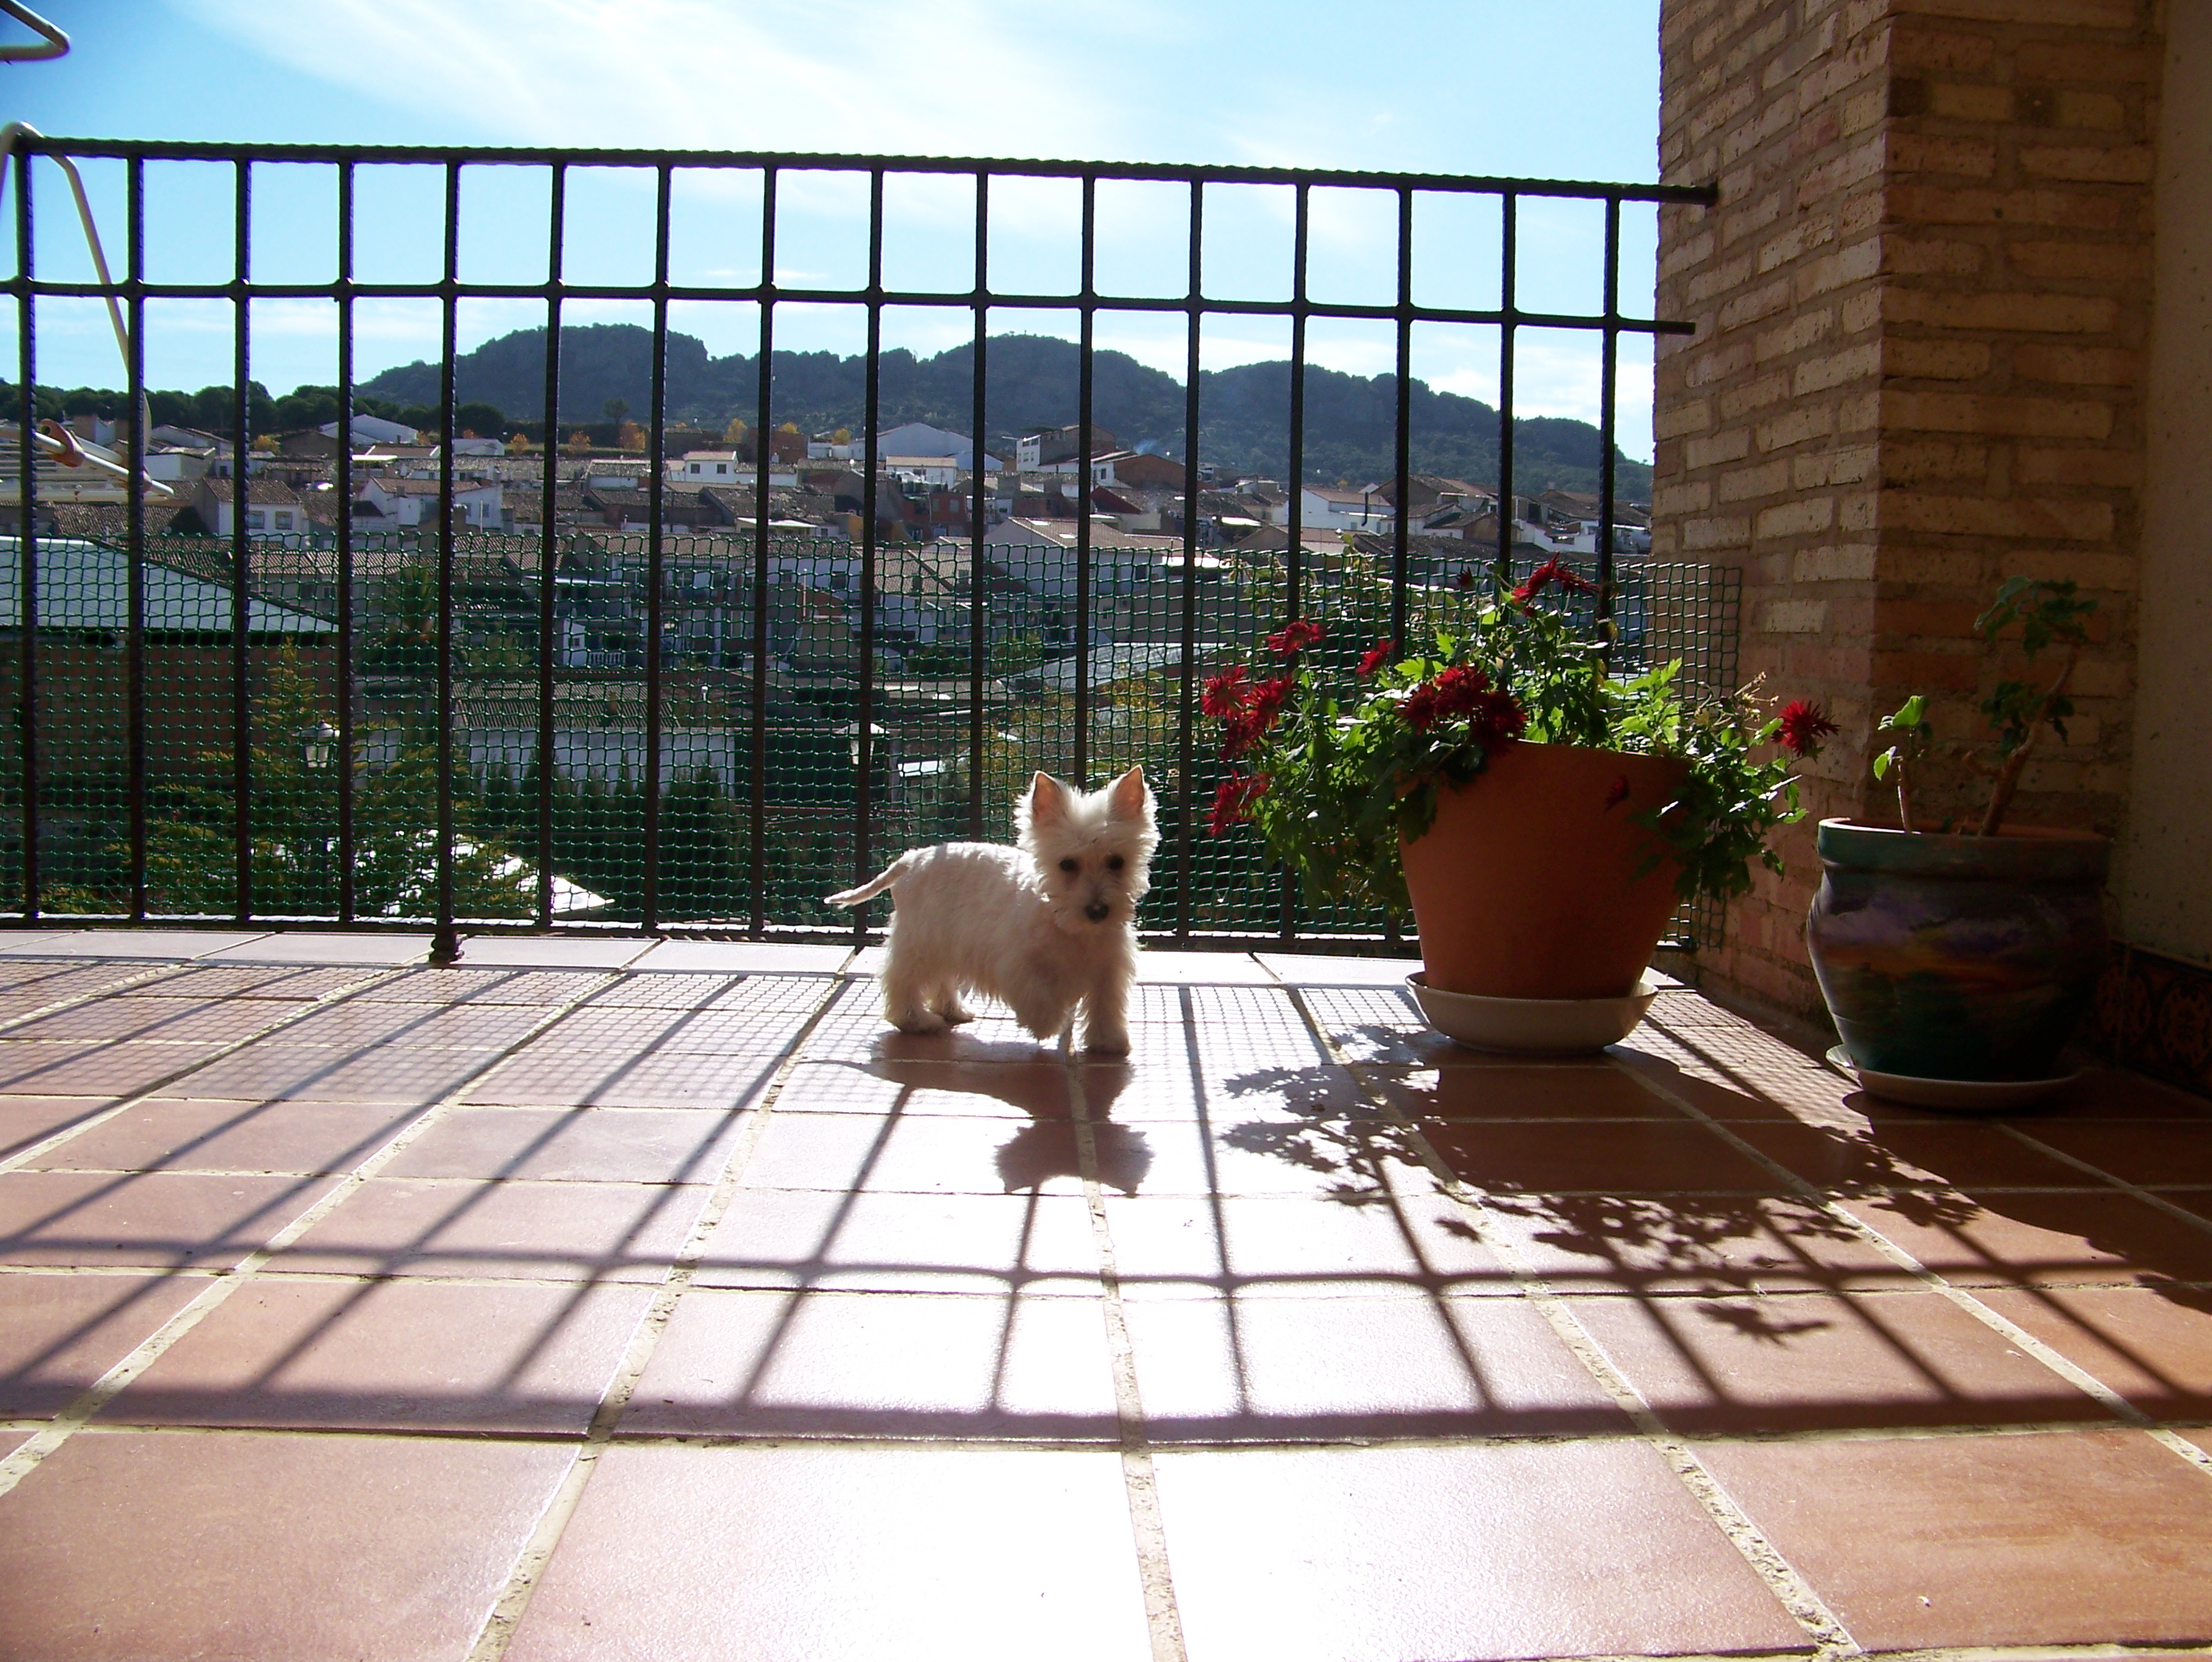 West Highland White Terrier de LaNeblina